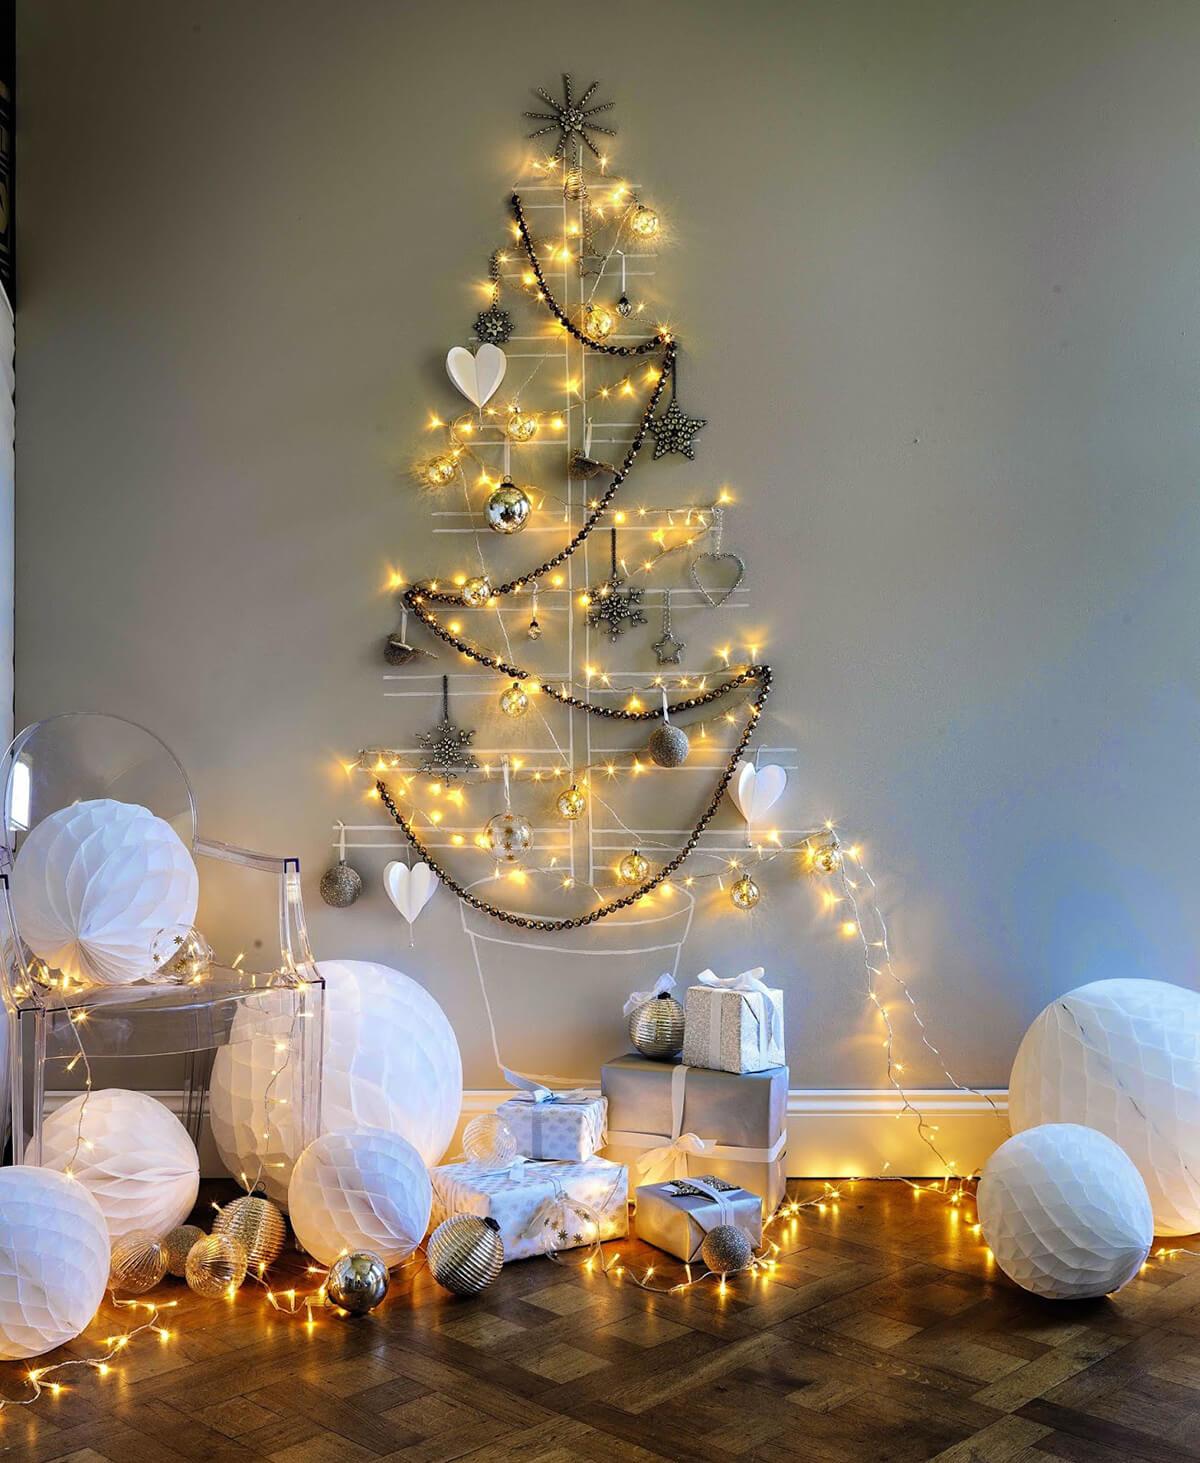 Brighten Up the Christmas Tree